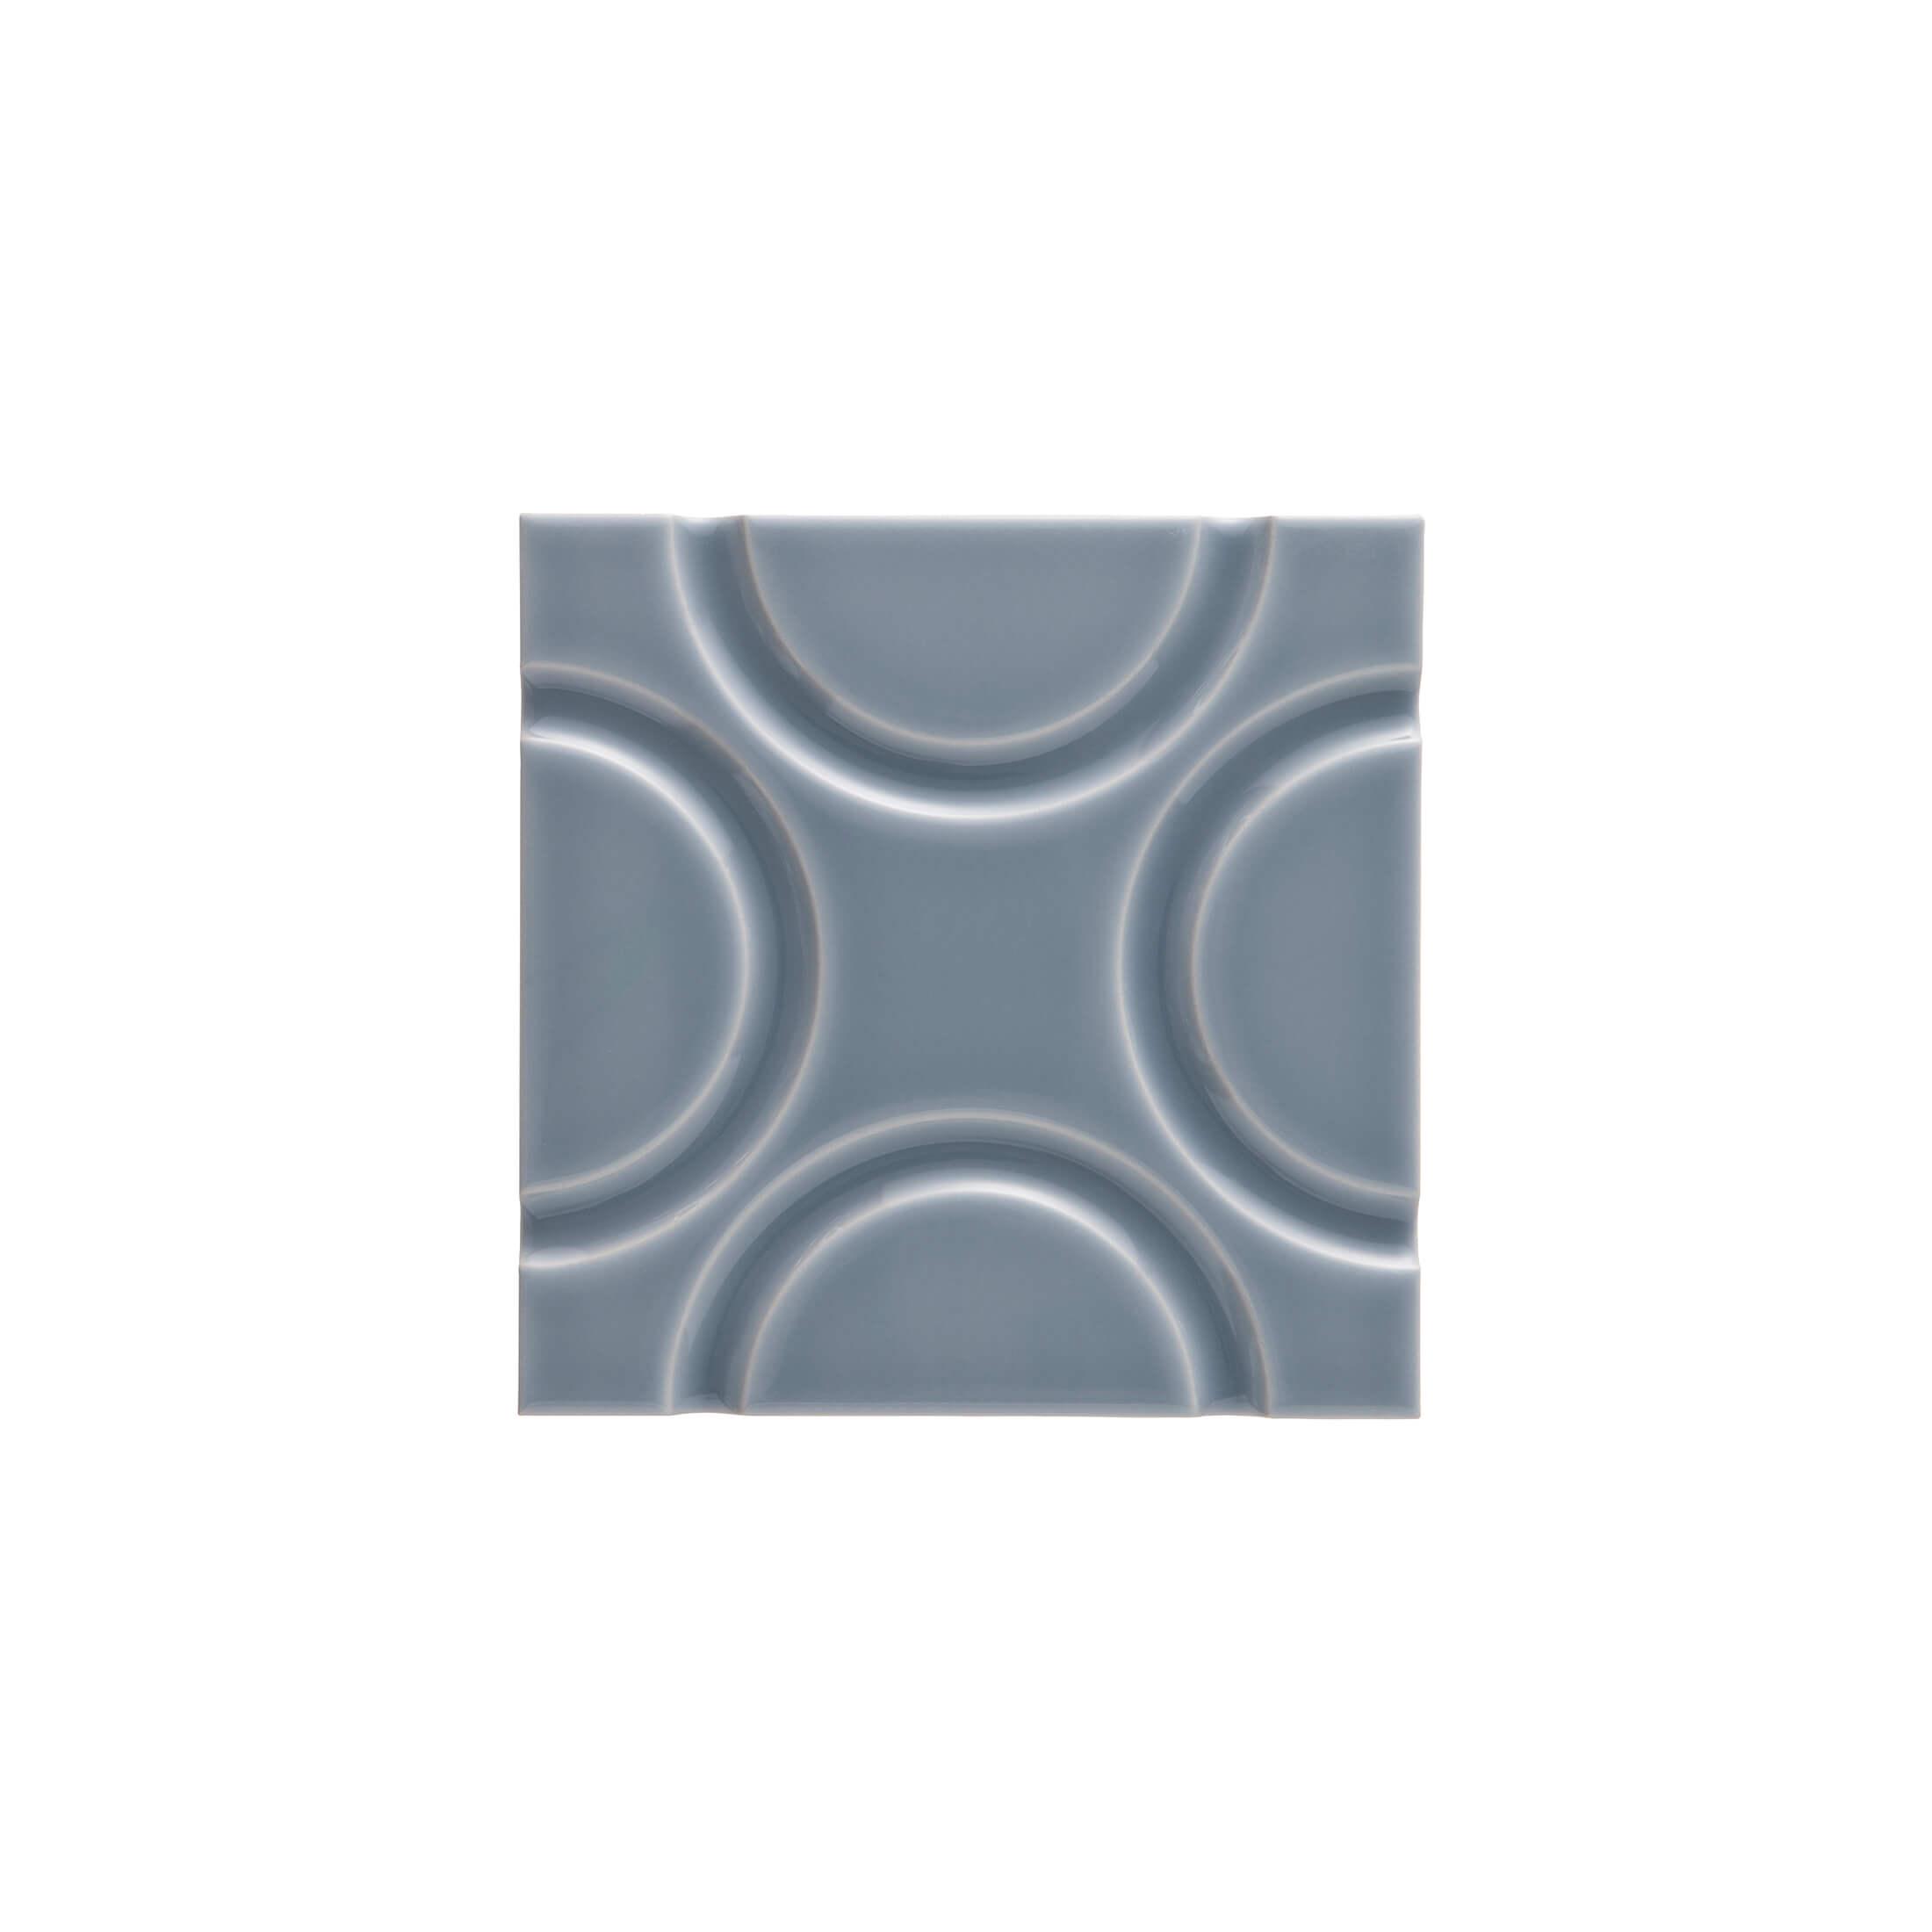 ADNE4144 - LISO GEO - 15 cm X 15 cm